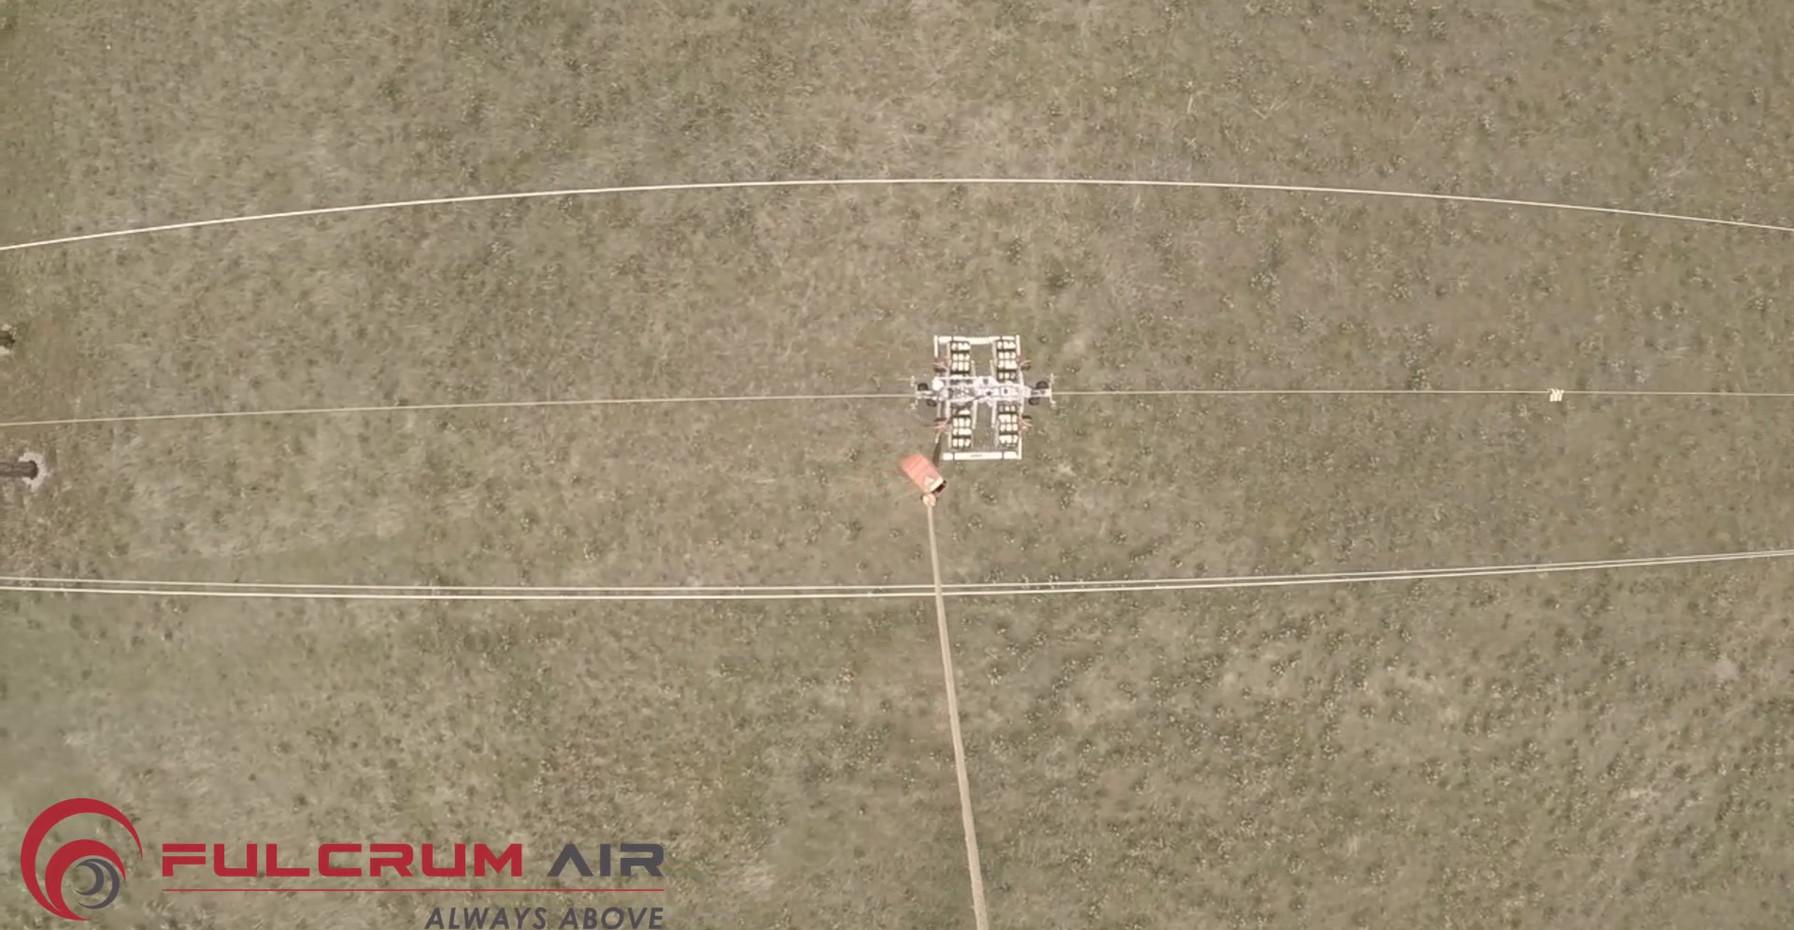 Fulcrum Air's LineFly: Start to Finish UAV BDF Installation